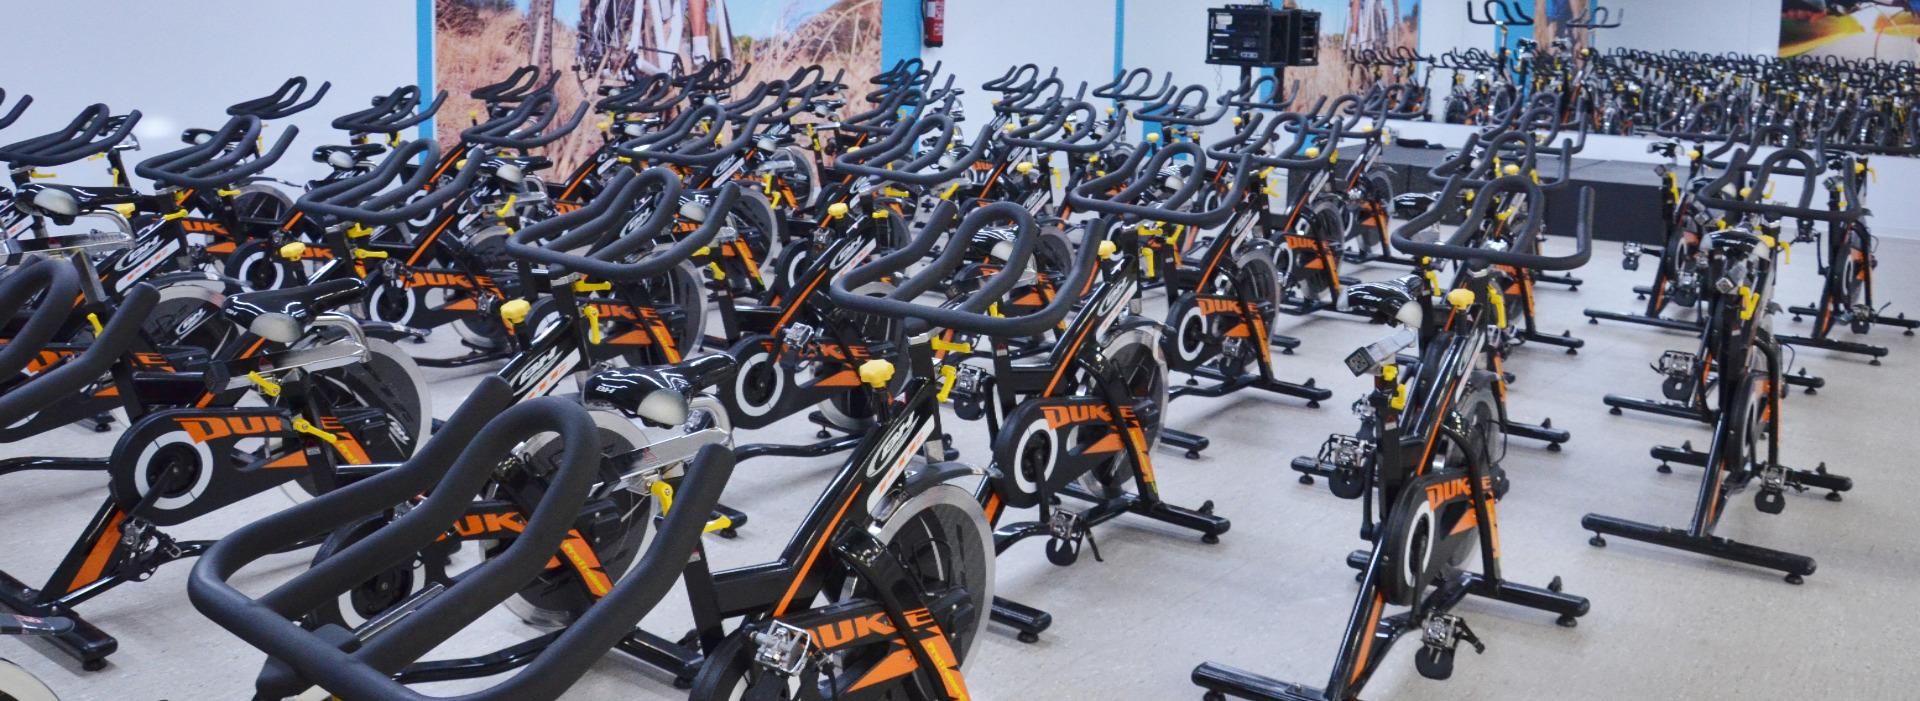 I-Fitness Las Palmas de Gran Canaria